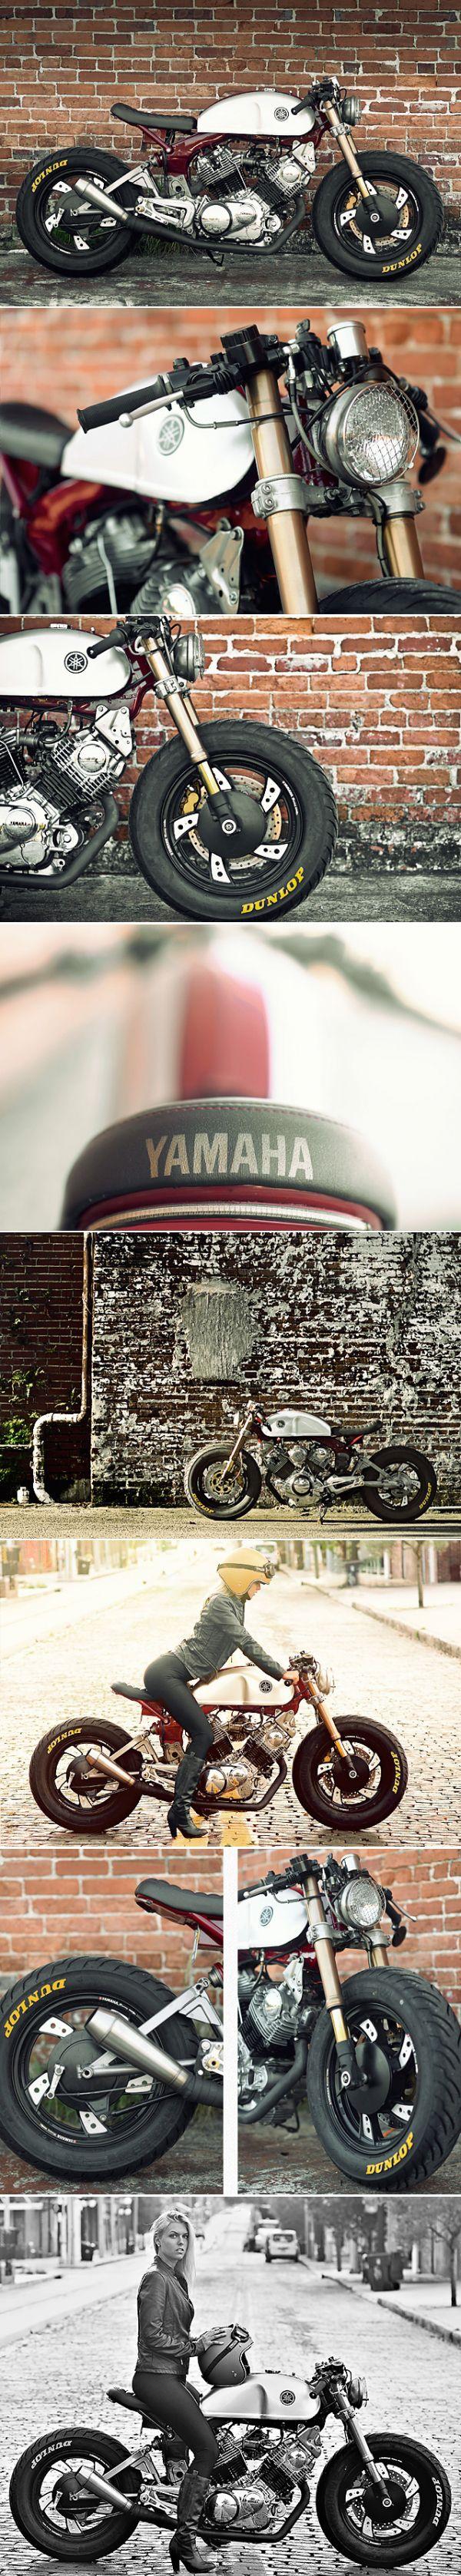 Yamaha XV750 – Hageman Motorcycles                                                                                                                                                                                 Más